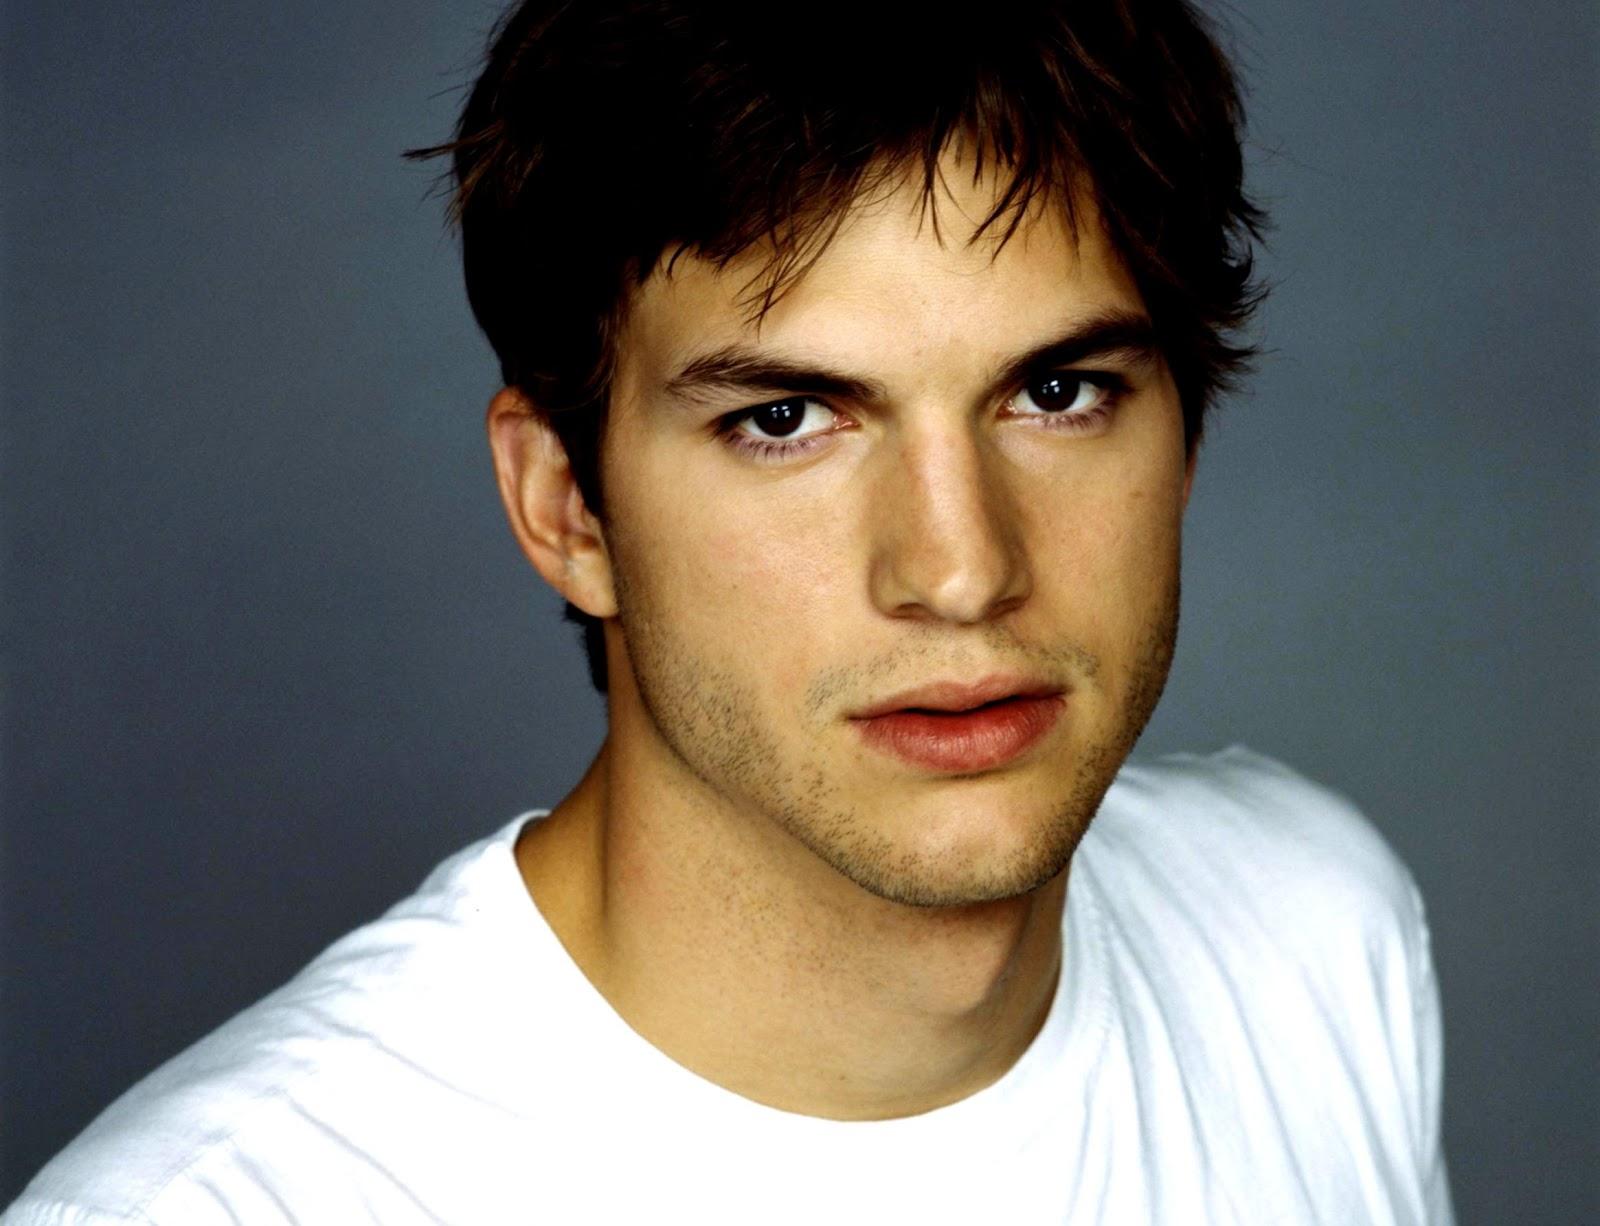 Ashton Kutcher Wallpapers HD Wallpapers 1600x1226